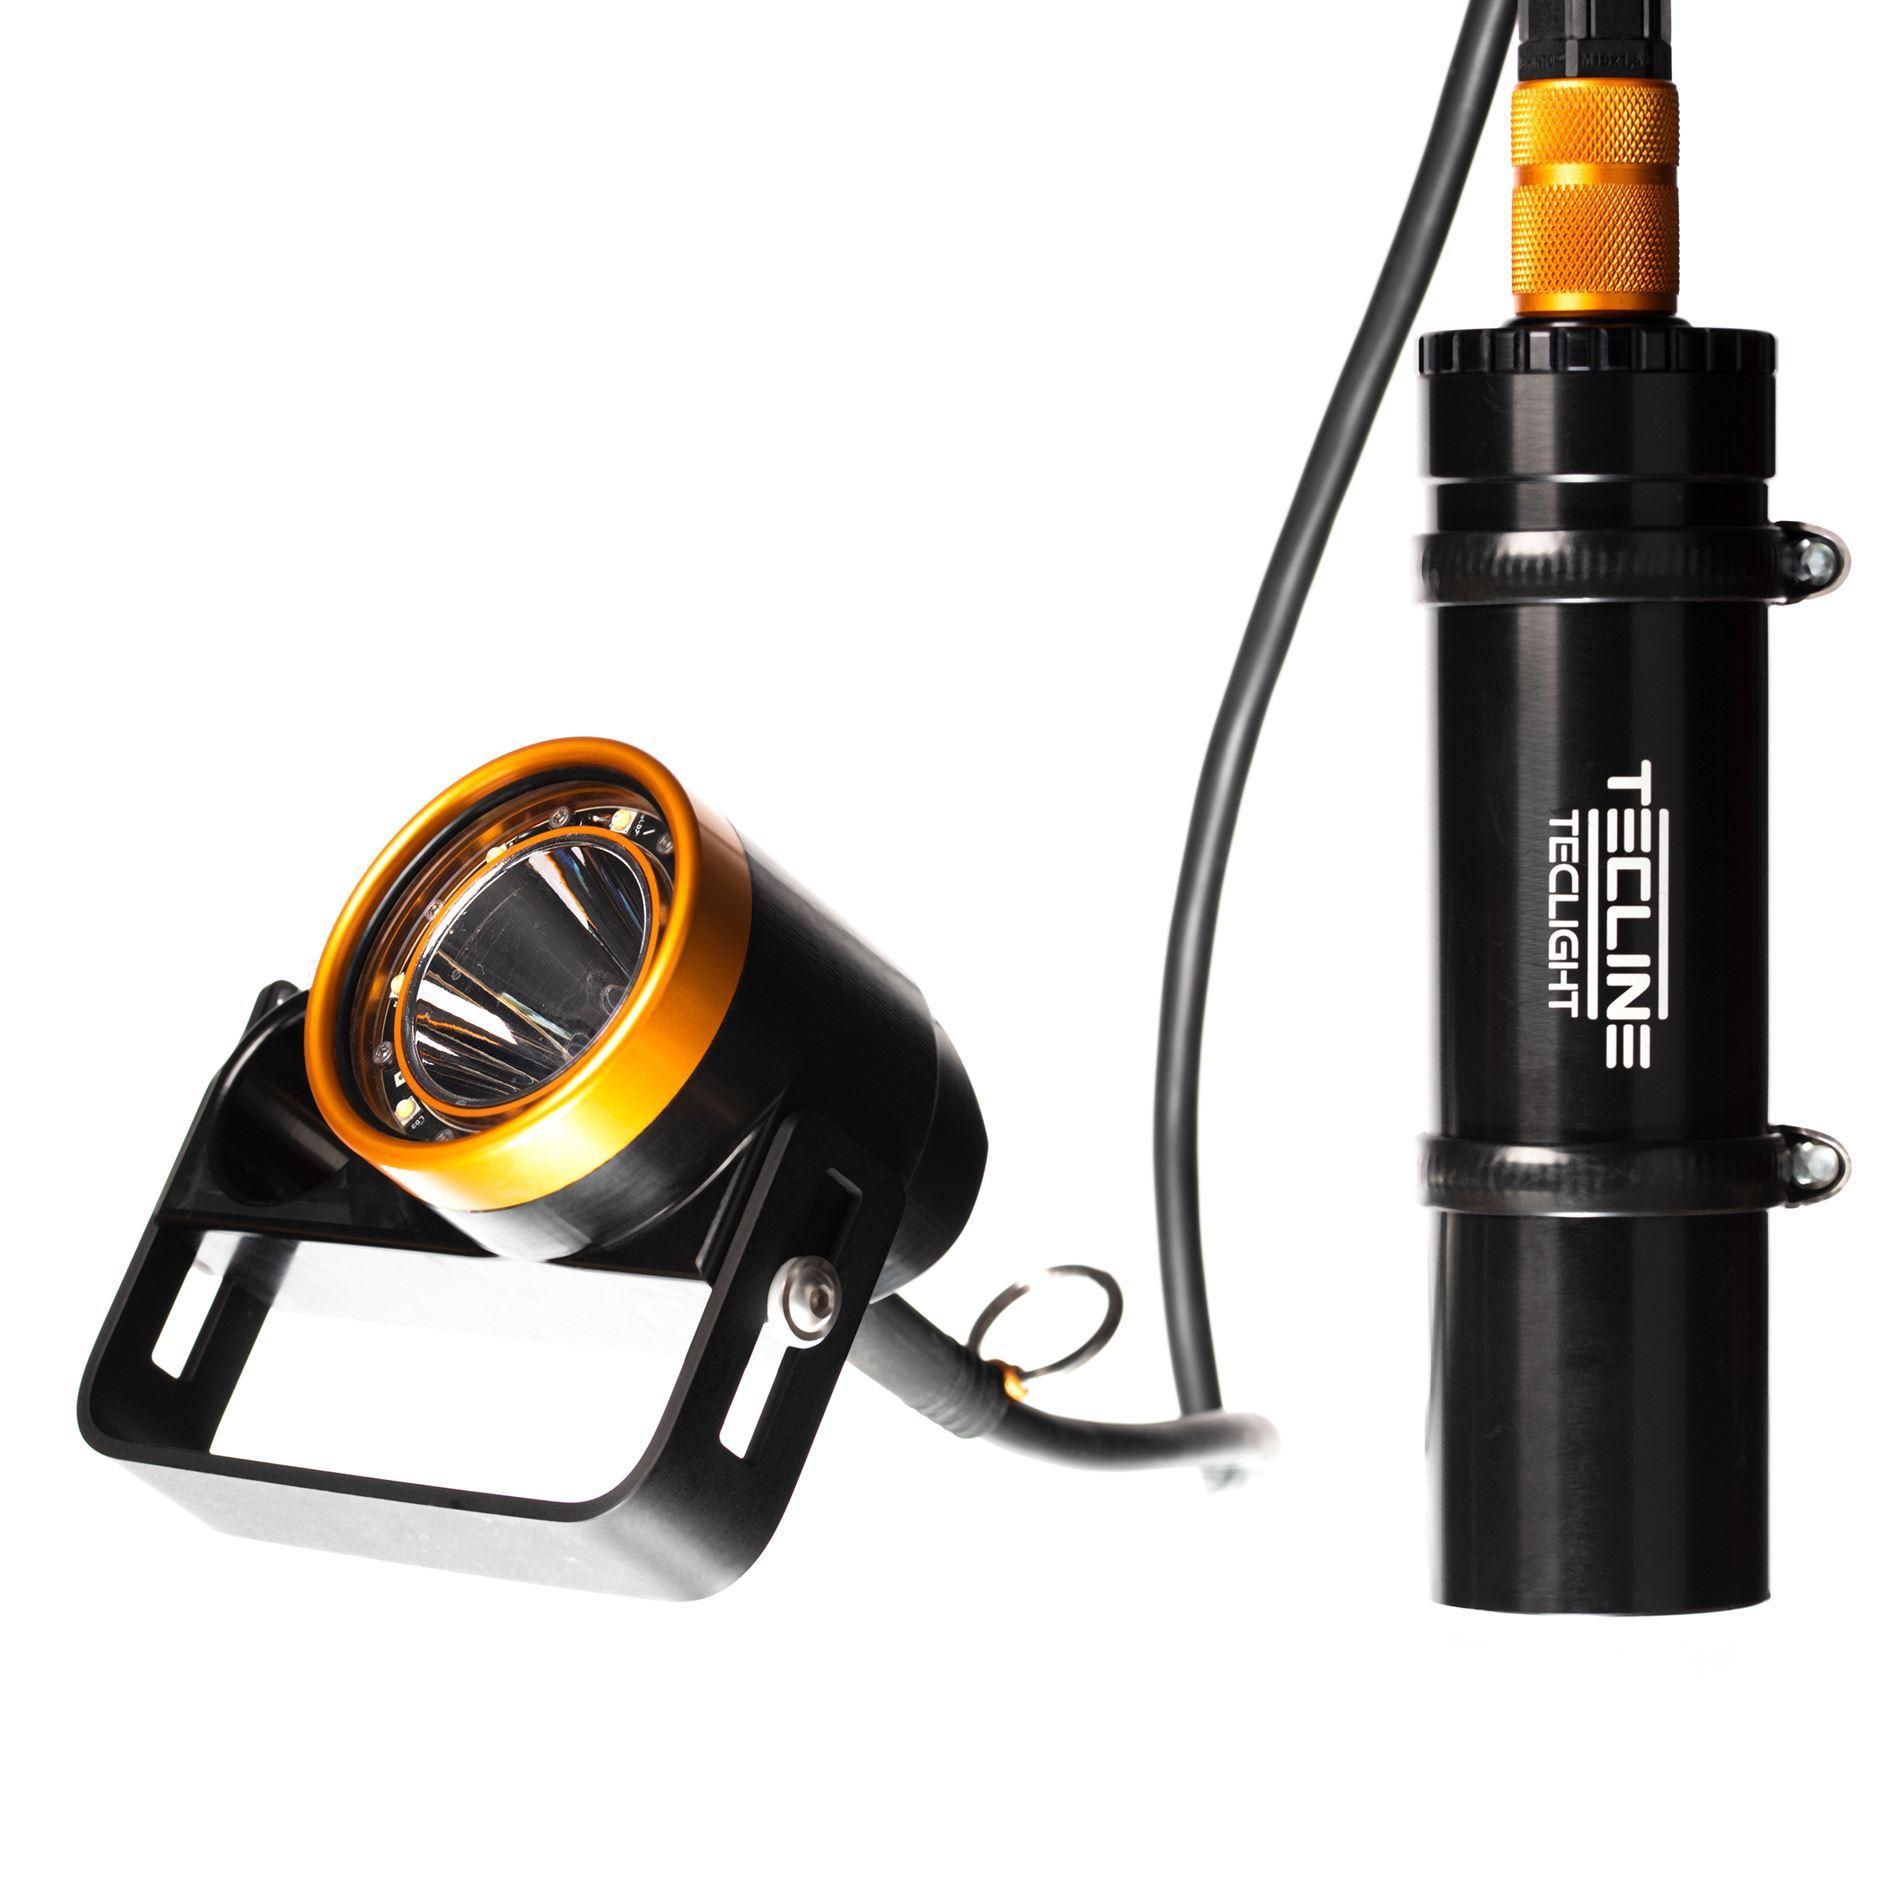 TECLINE LIGHTS LED TECLIGHT STANDARD, 3900 LM LED TECLIGHT STANDARD, 3900 LM thumbnail